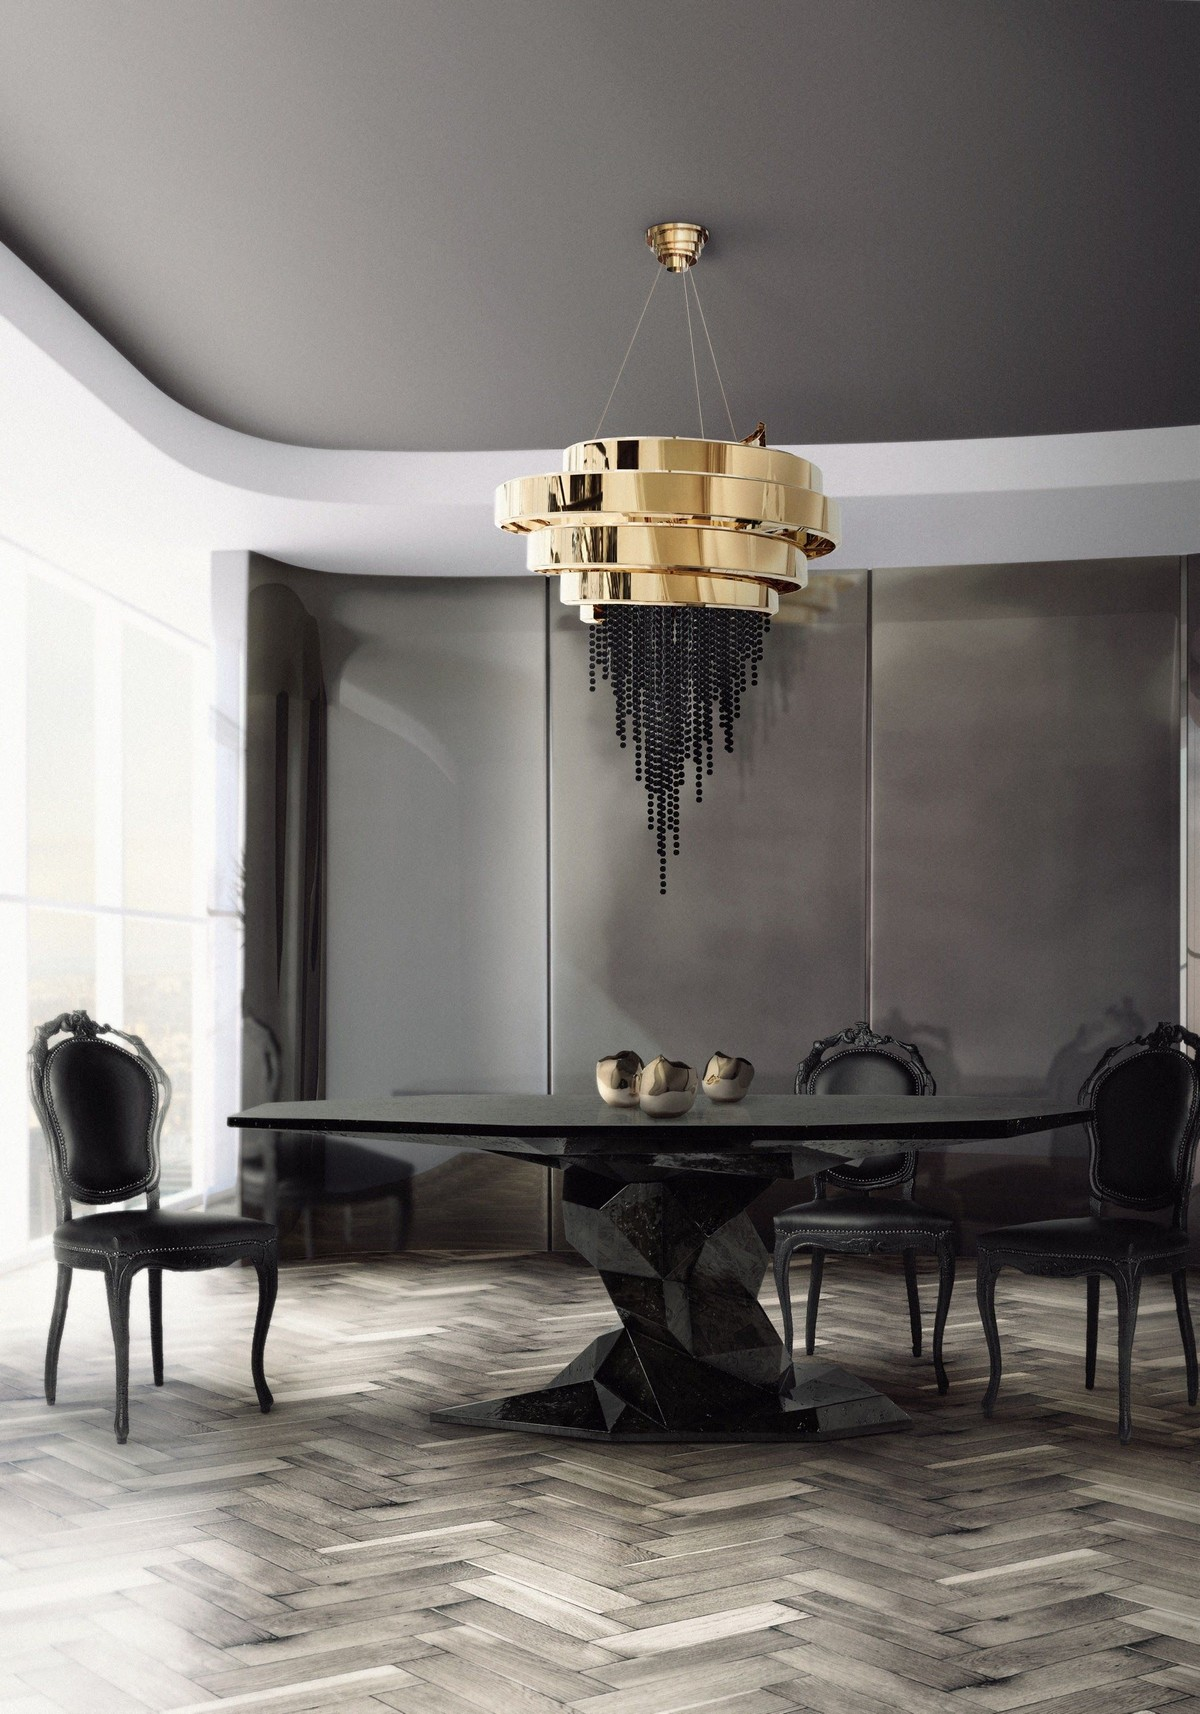 Awe-inspiring Dining Room Decor Inspirations (Part III) dining room decor Awe-inspiring Dining Room Decor Inspirations (Part III) bbbb